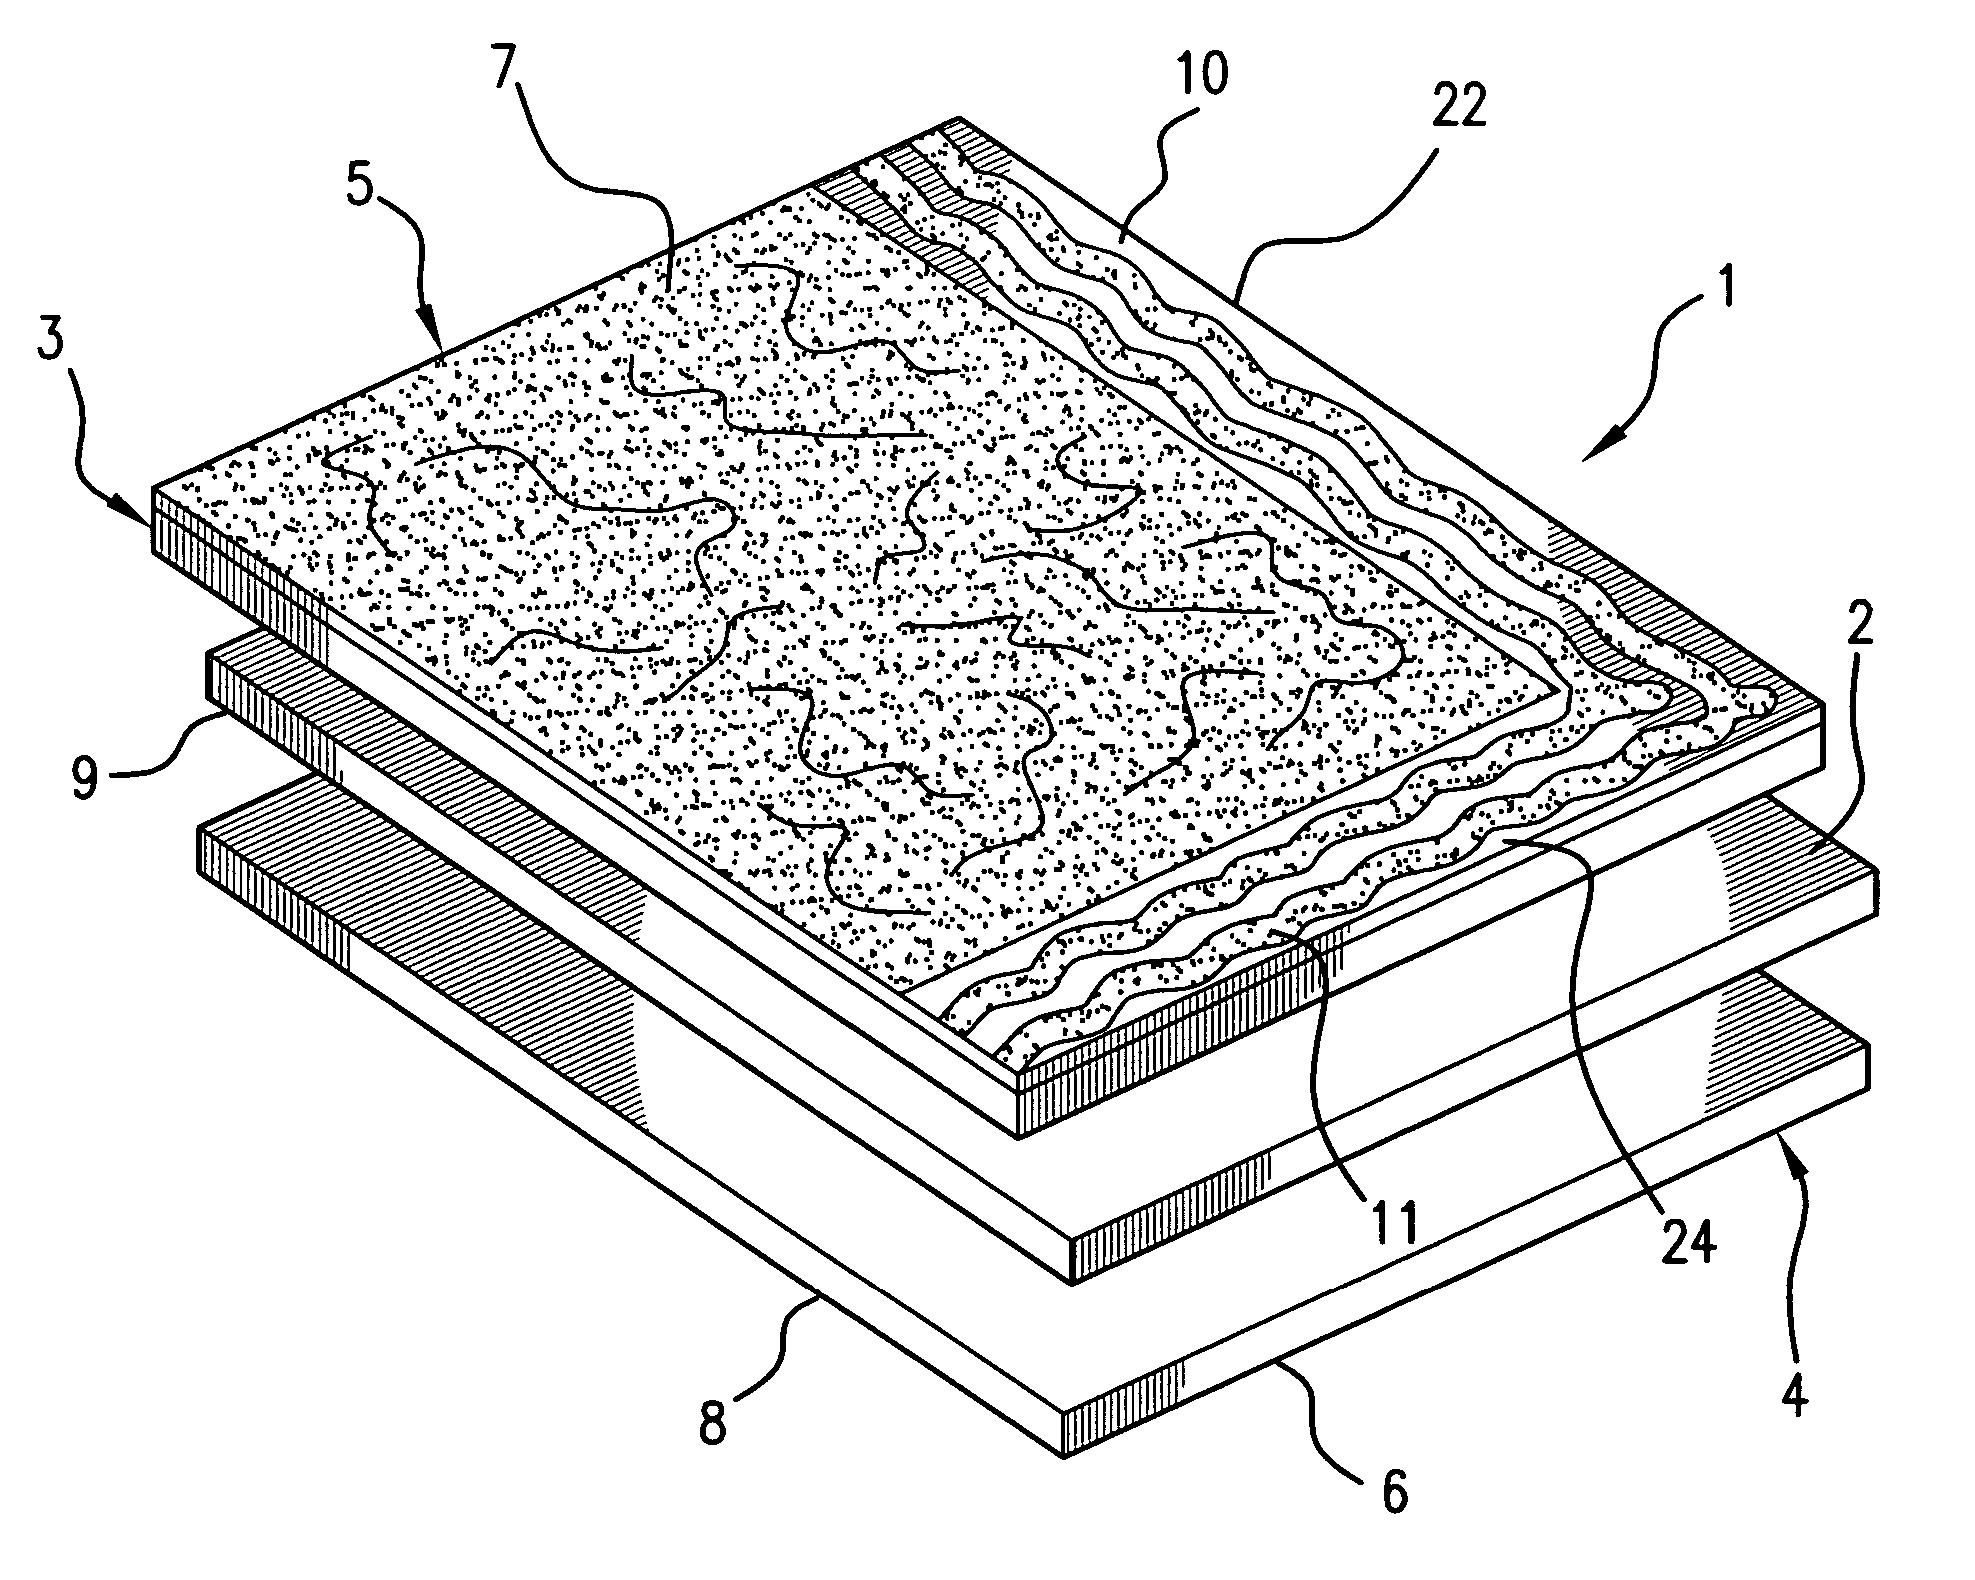 Self Sealing Membrane Roof : Patent us self adhesive ventilating waterproofing